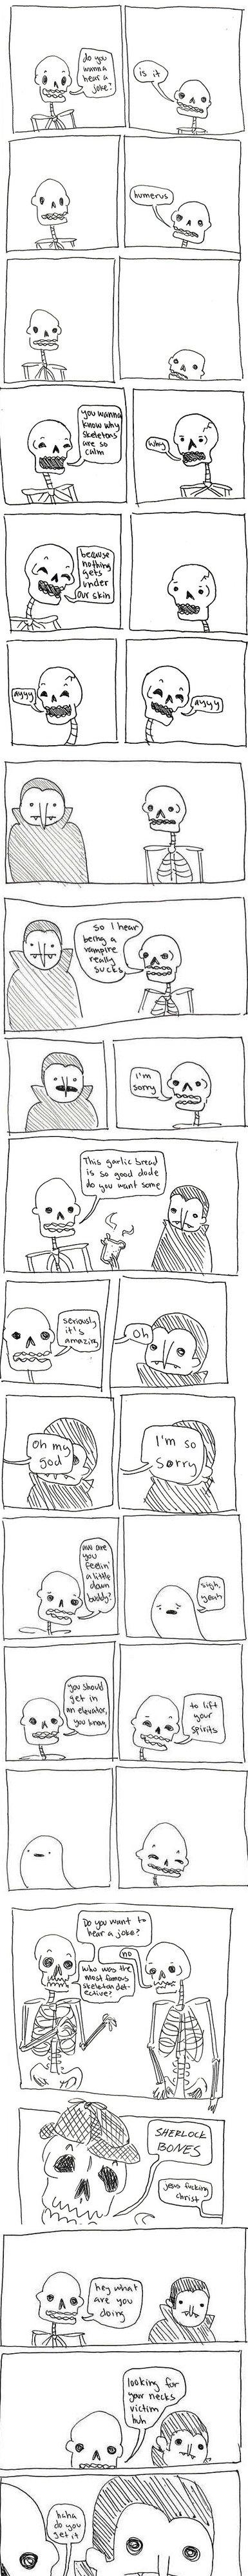 funny bones. source imgur.com/a/bxJHK?gallery. t: erra. burn}. mfw funny bones source imgur com/a/bxJHK?gallery t: erra burn} mfw